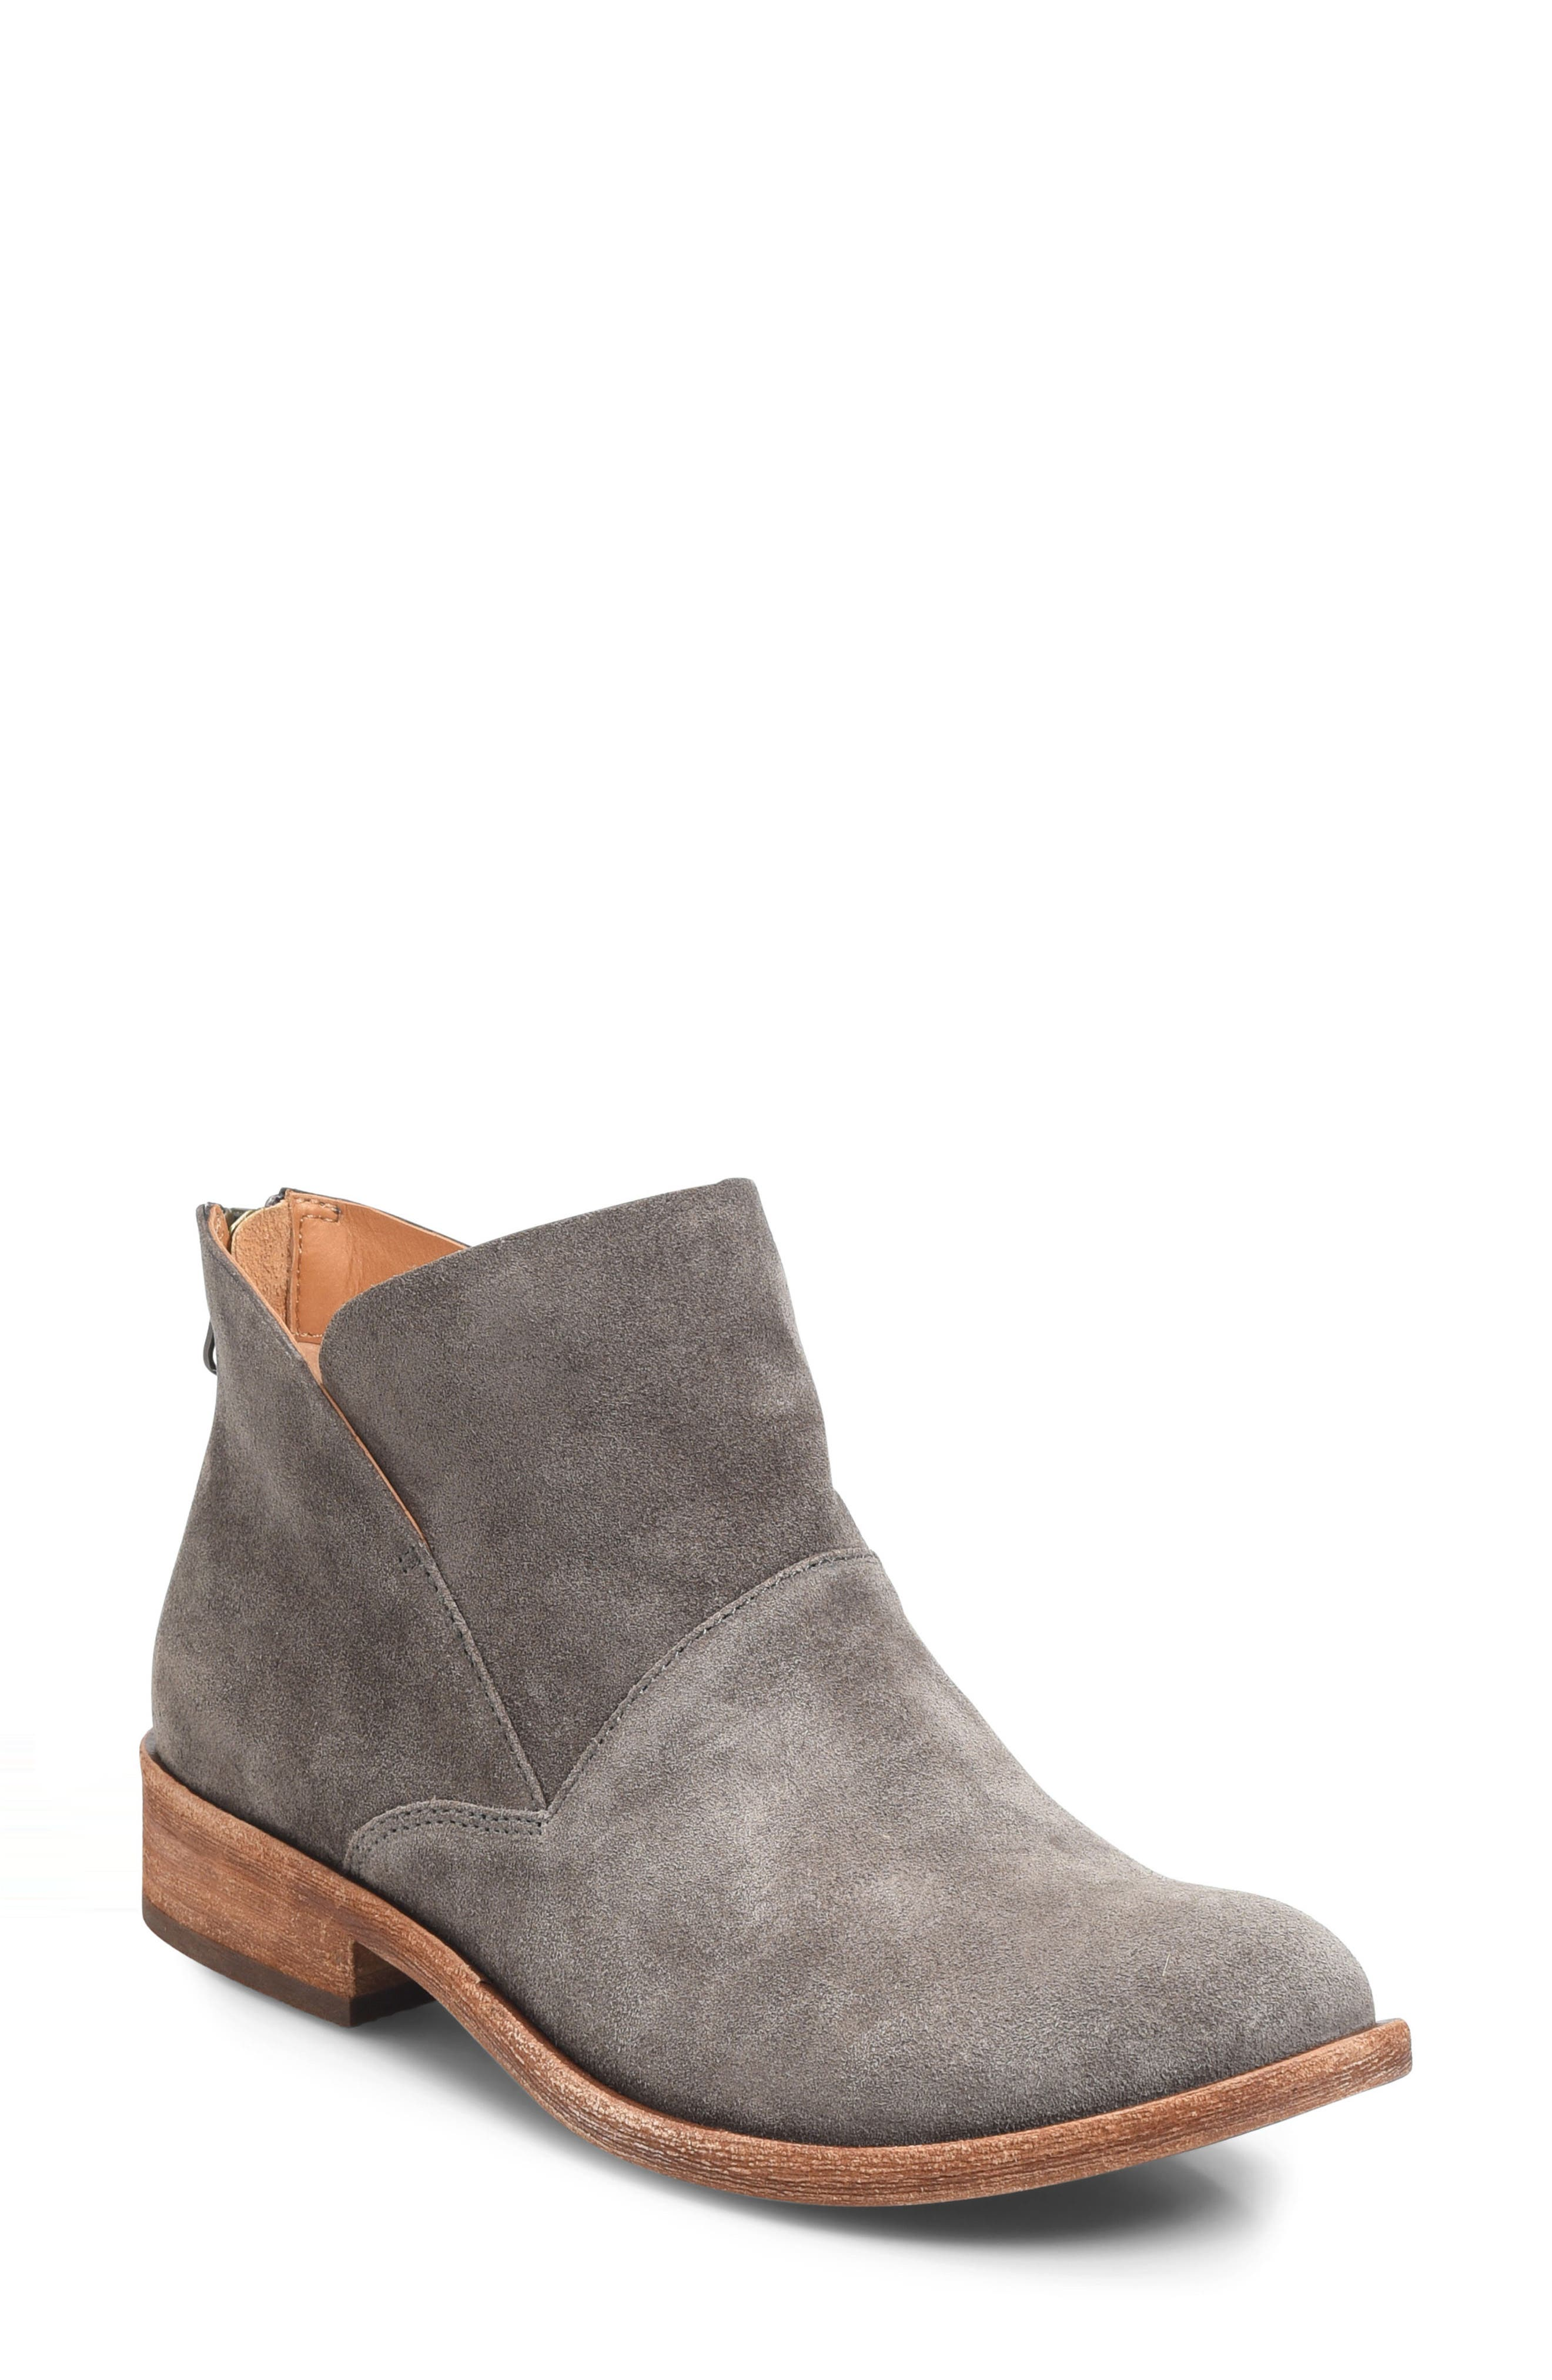 Alternate Image 1 Selected - Kork-Ease® Ryder Ankle Boot (Women)